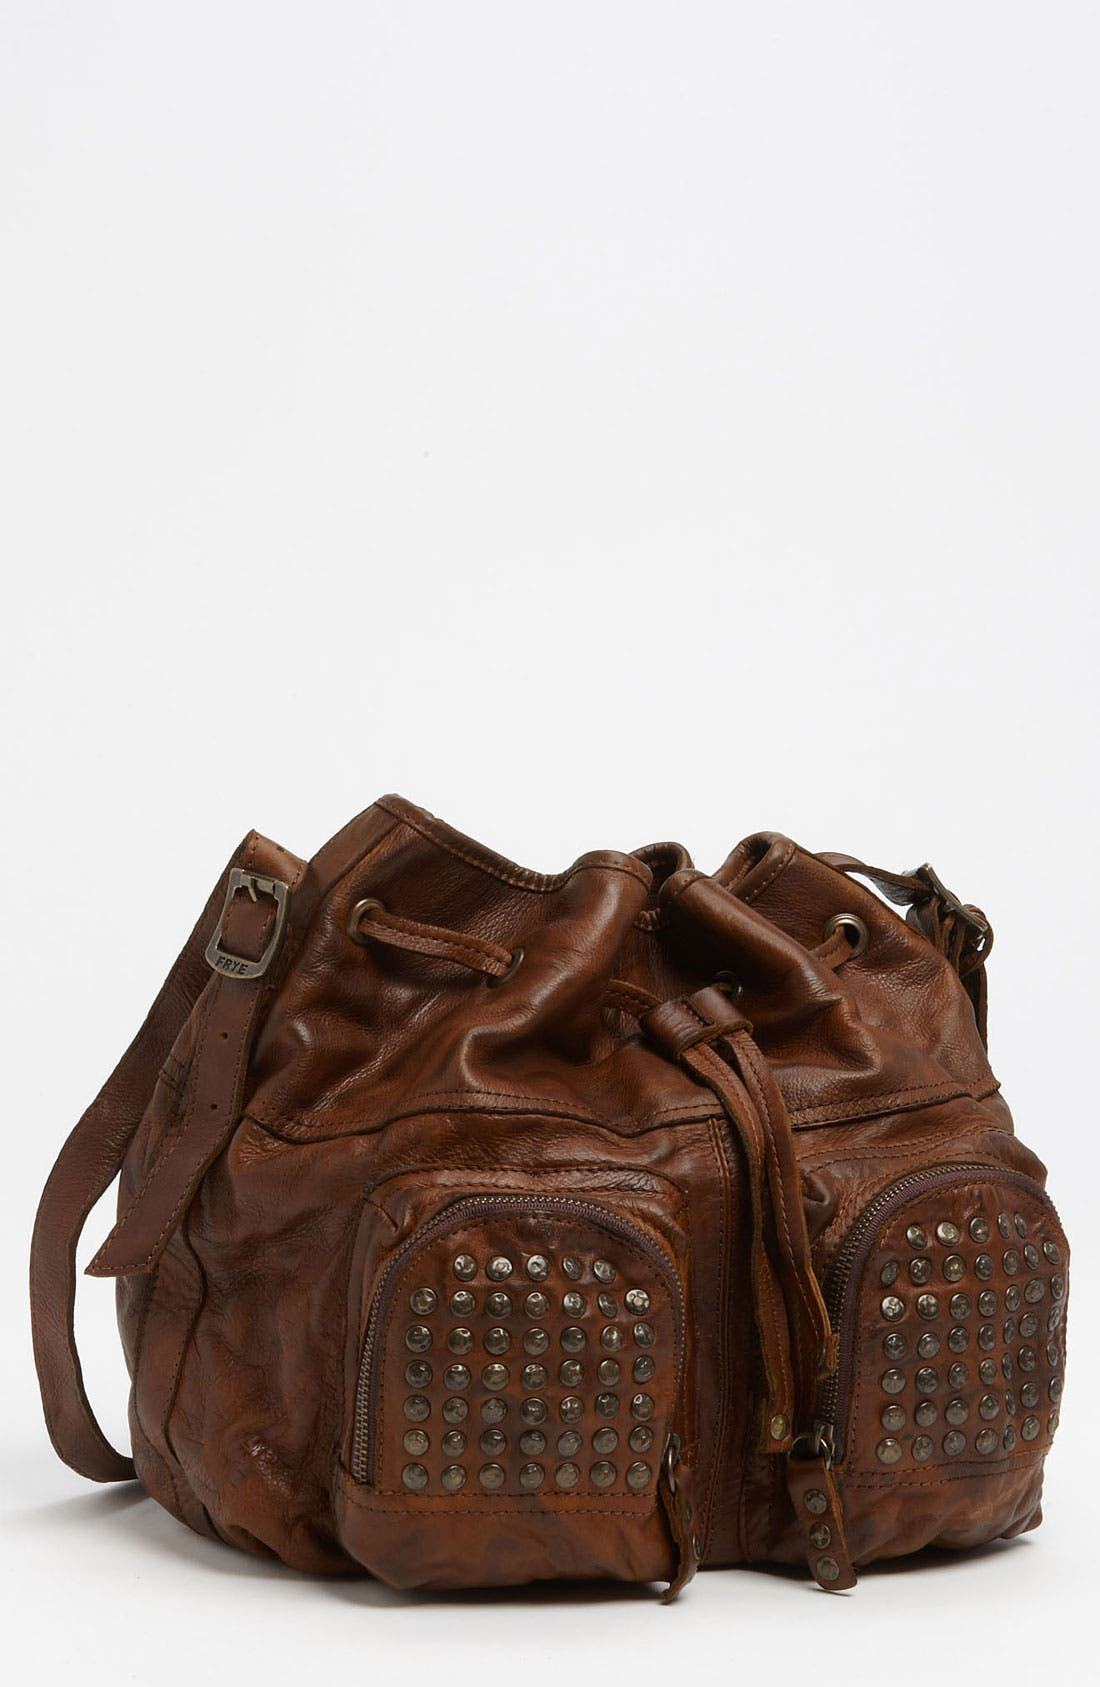 Main Image - Frye 'Brooke' Drawstring Shoulder Bag, Medium